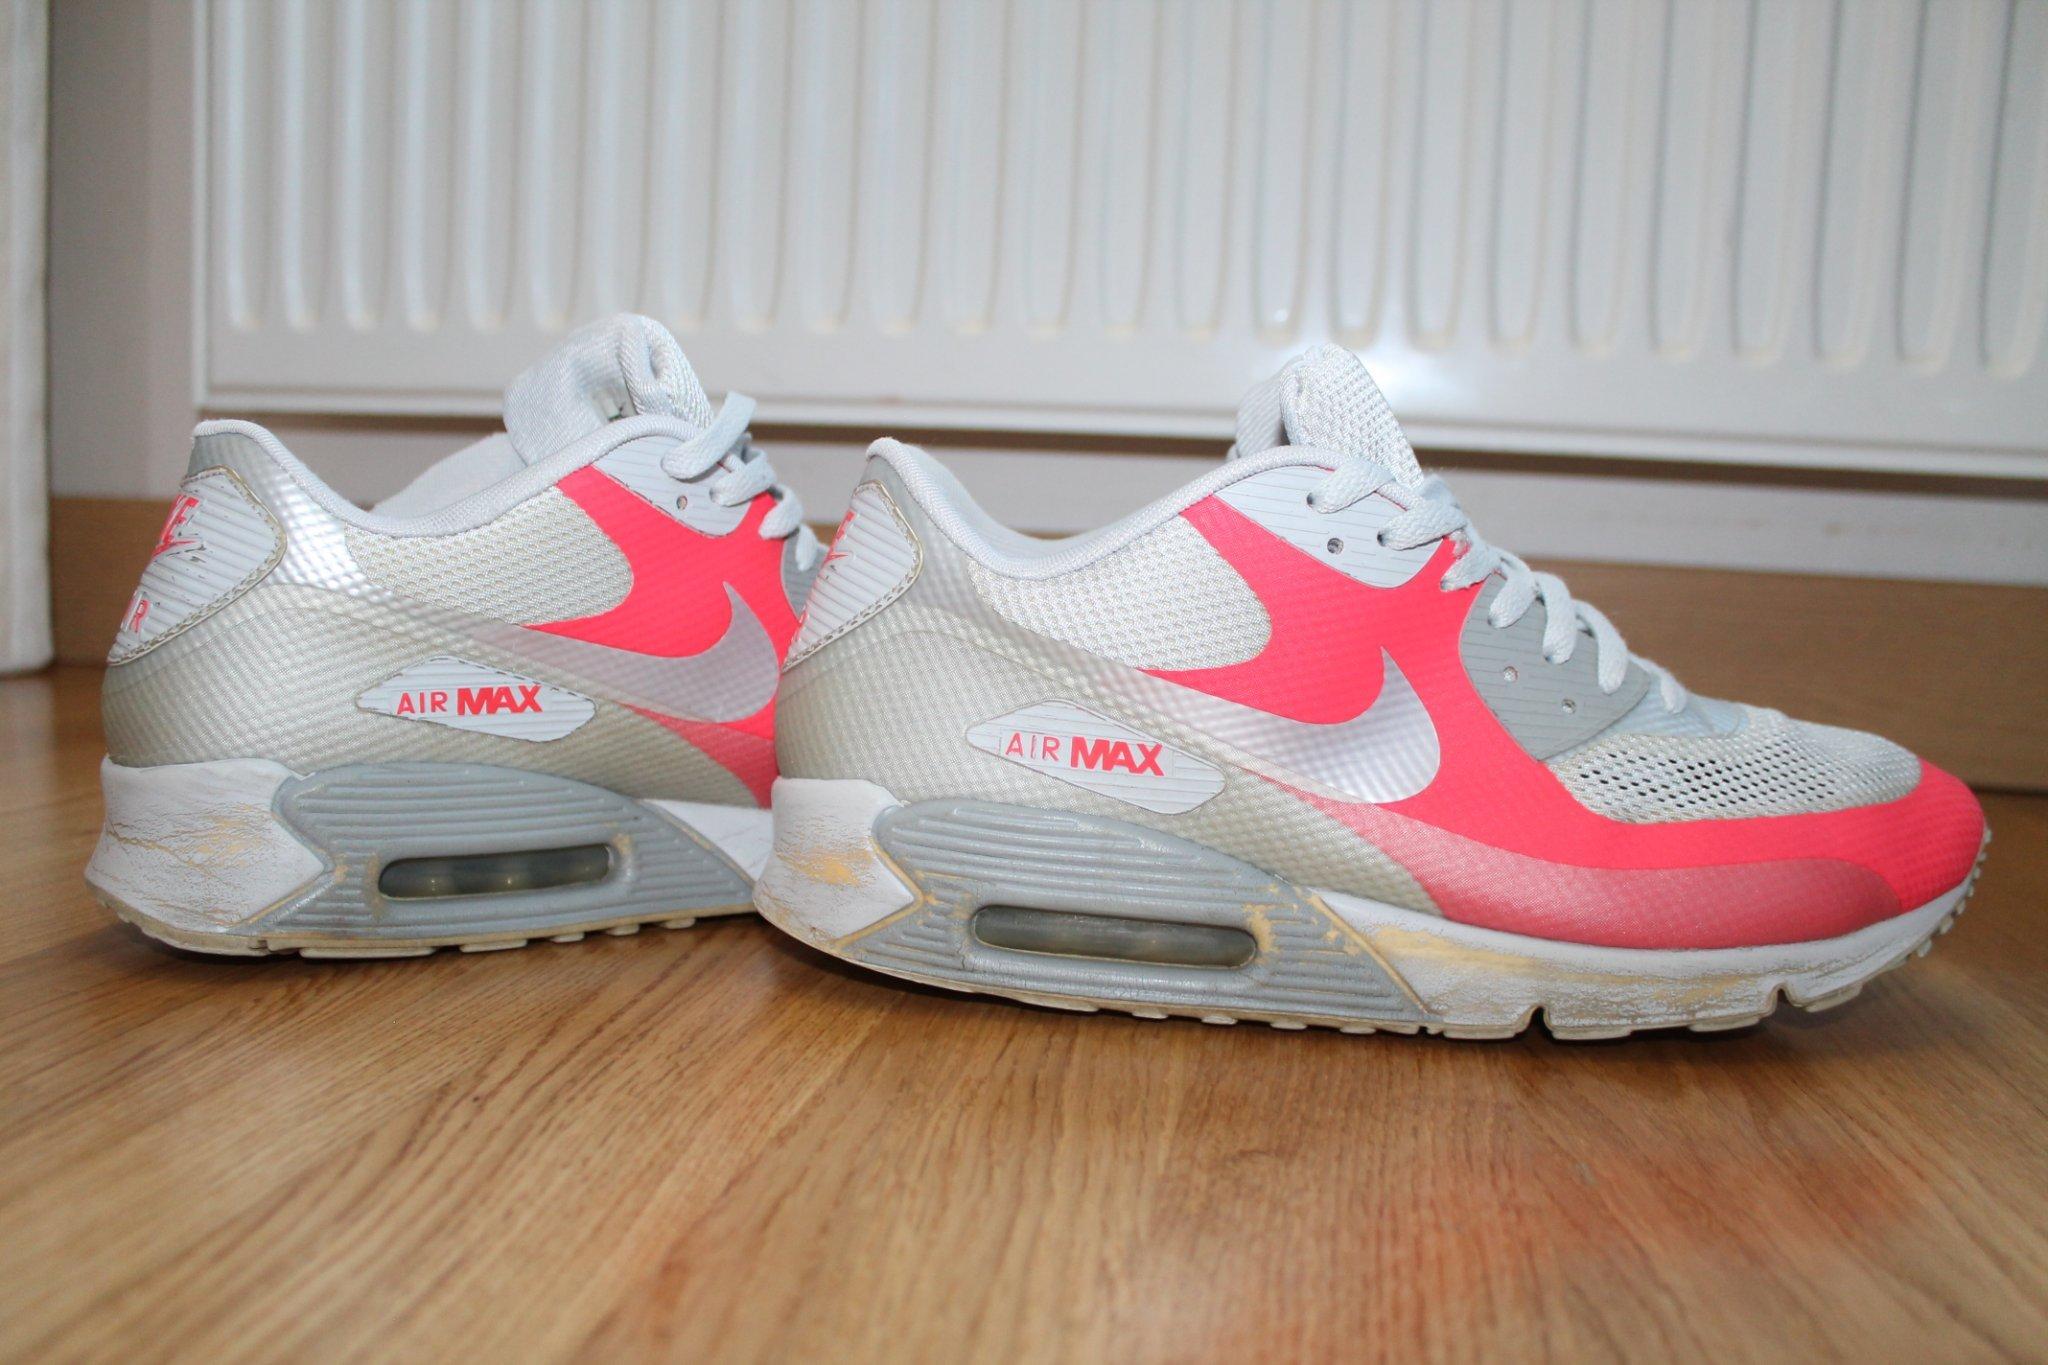 Nike Air Max Hyperfuse Träningsskor i storlek 4.. (357457482